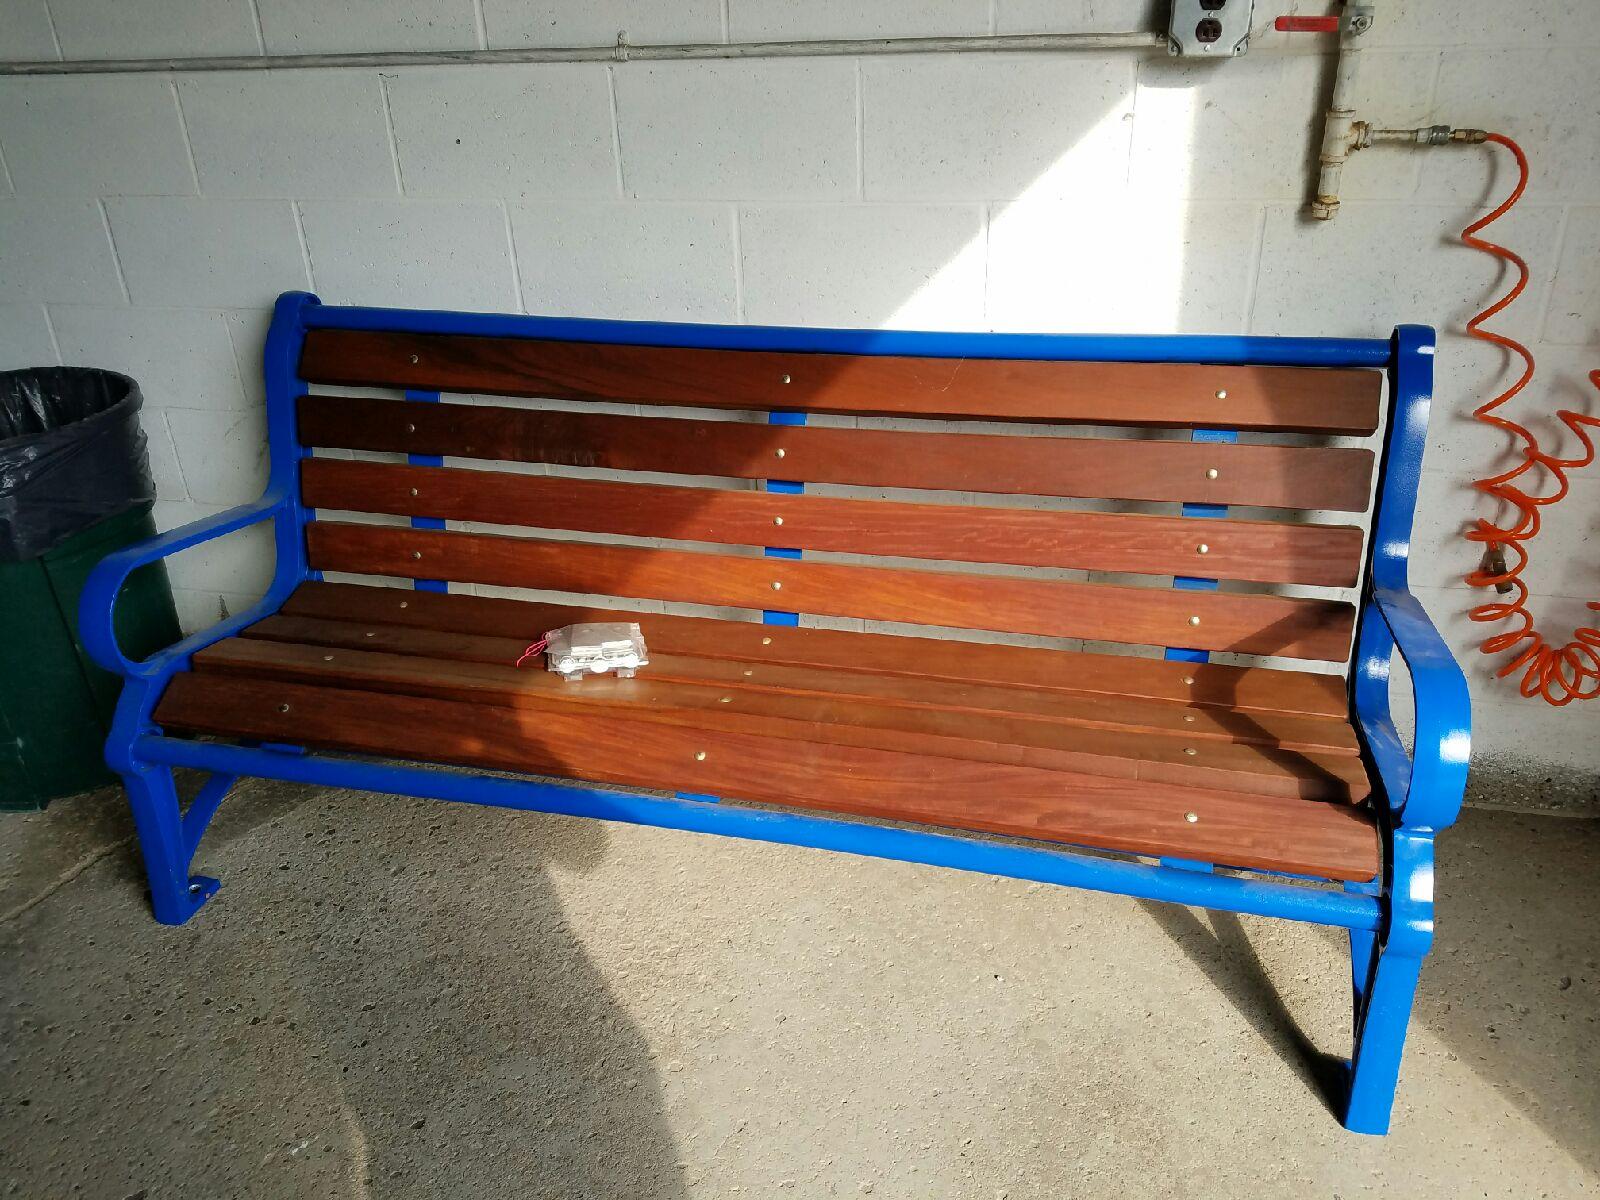 Bench donated for James Metz. (Courtesy of Steve Metz)